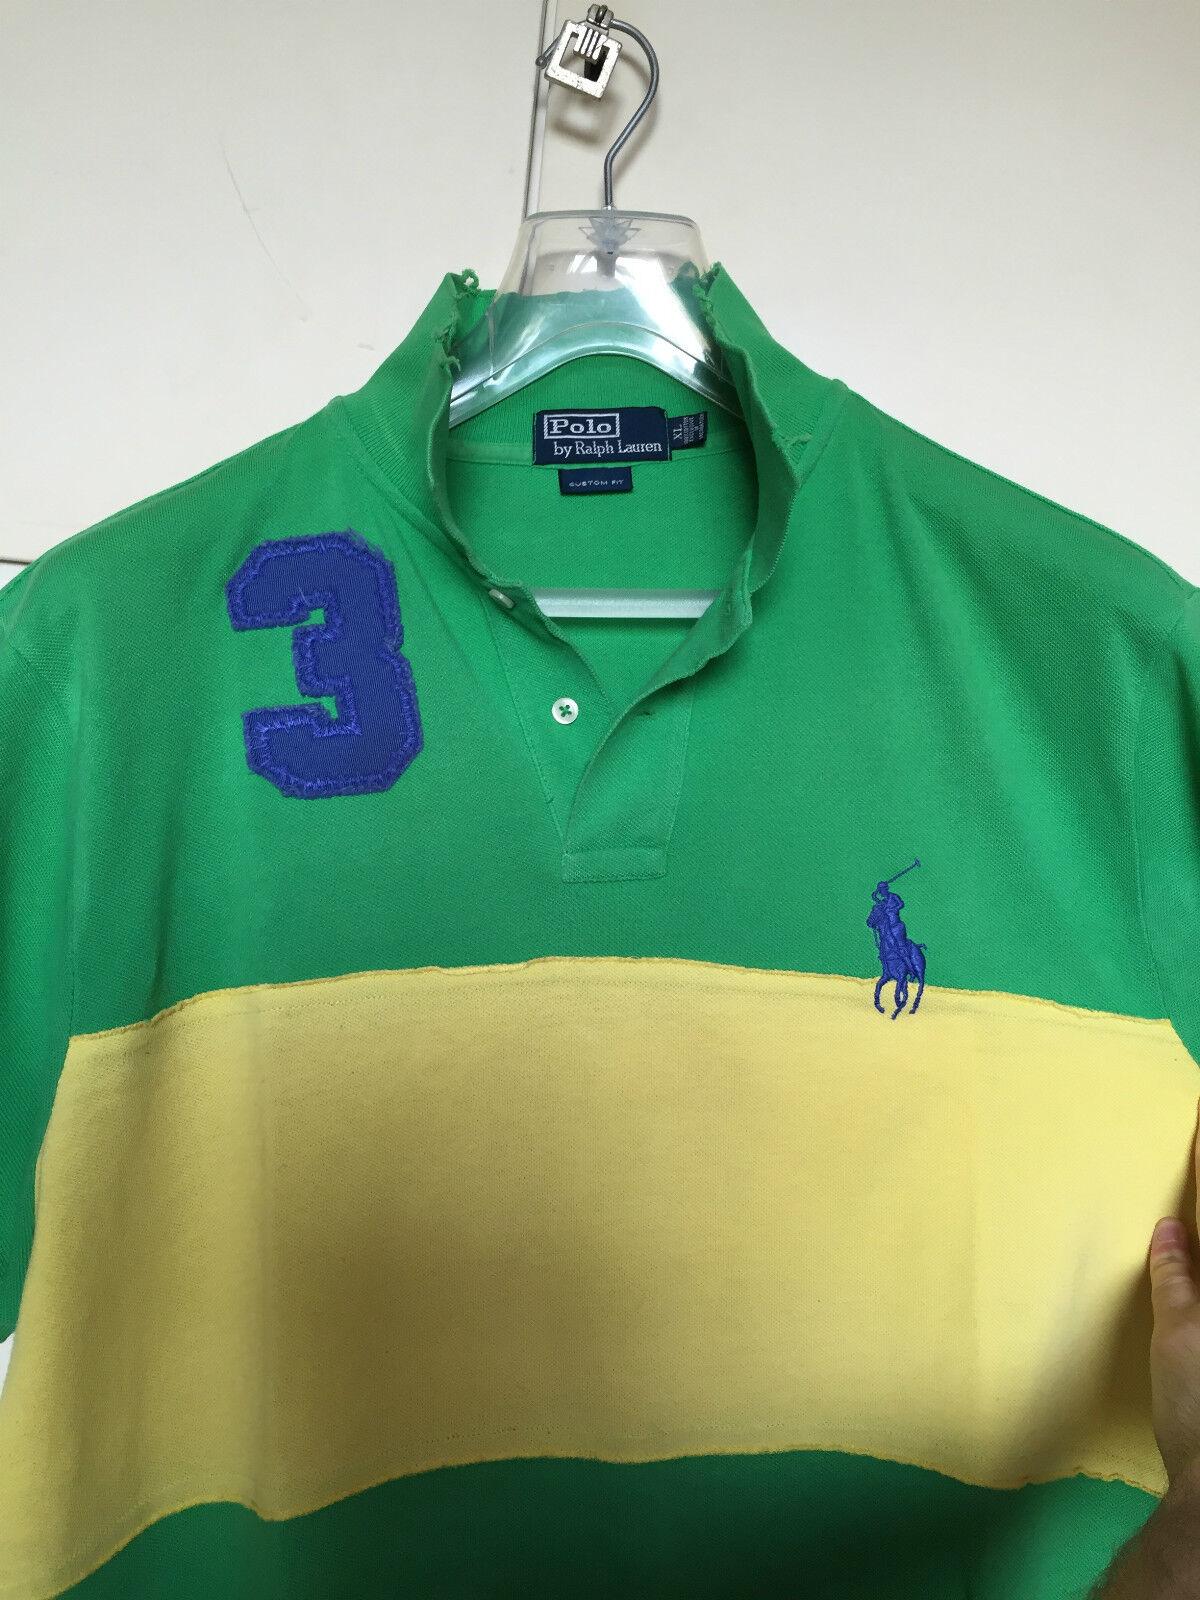 Maglia polo uomo POLO POLO POLO RALPH LAUREN verde e gialla tg. XL custom fit big pony blu 207810